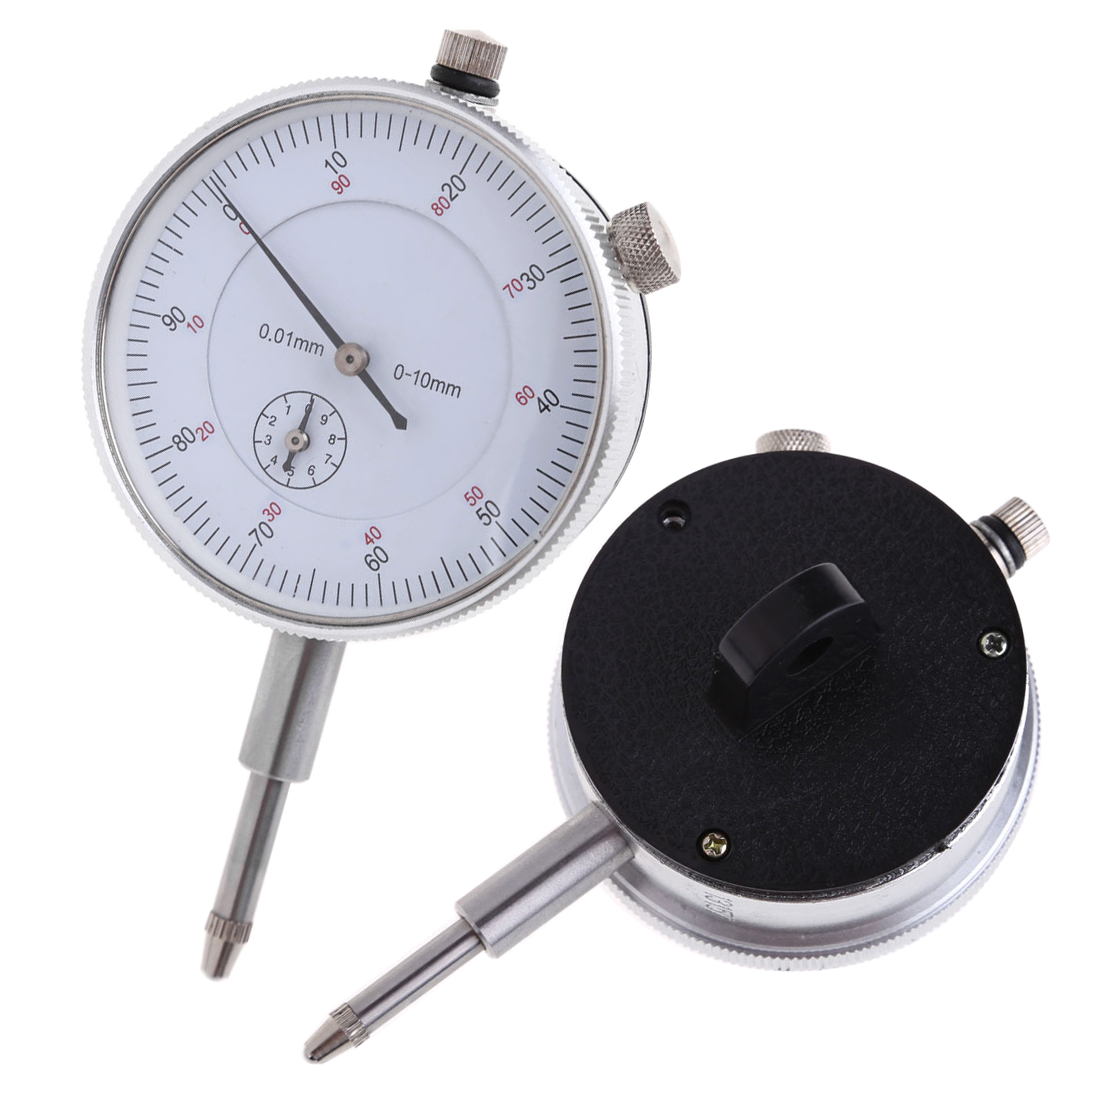 Précision 0.01mm cadran indicateur jauge 0-10mm mètre précis 0.01mm résolution indicateur jauge Mesure Instrument outil cadran jauge